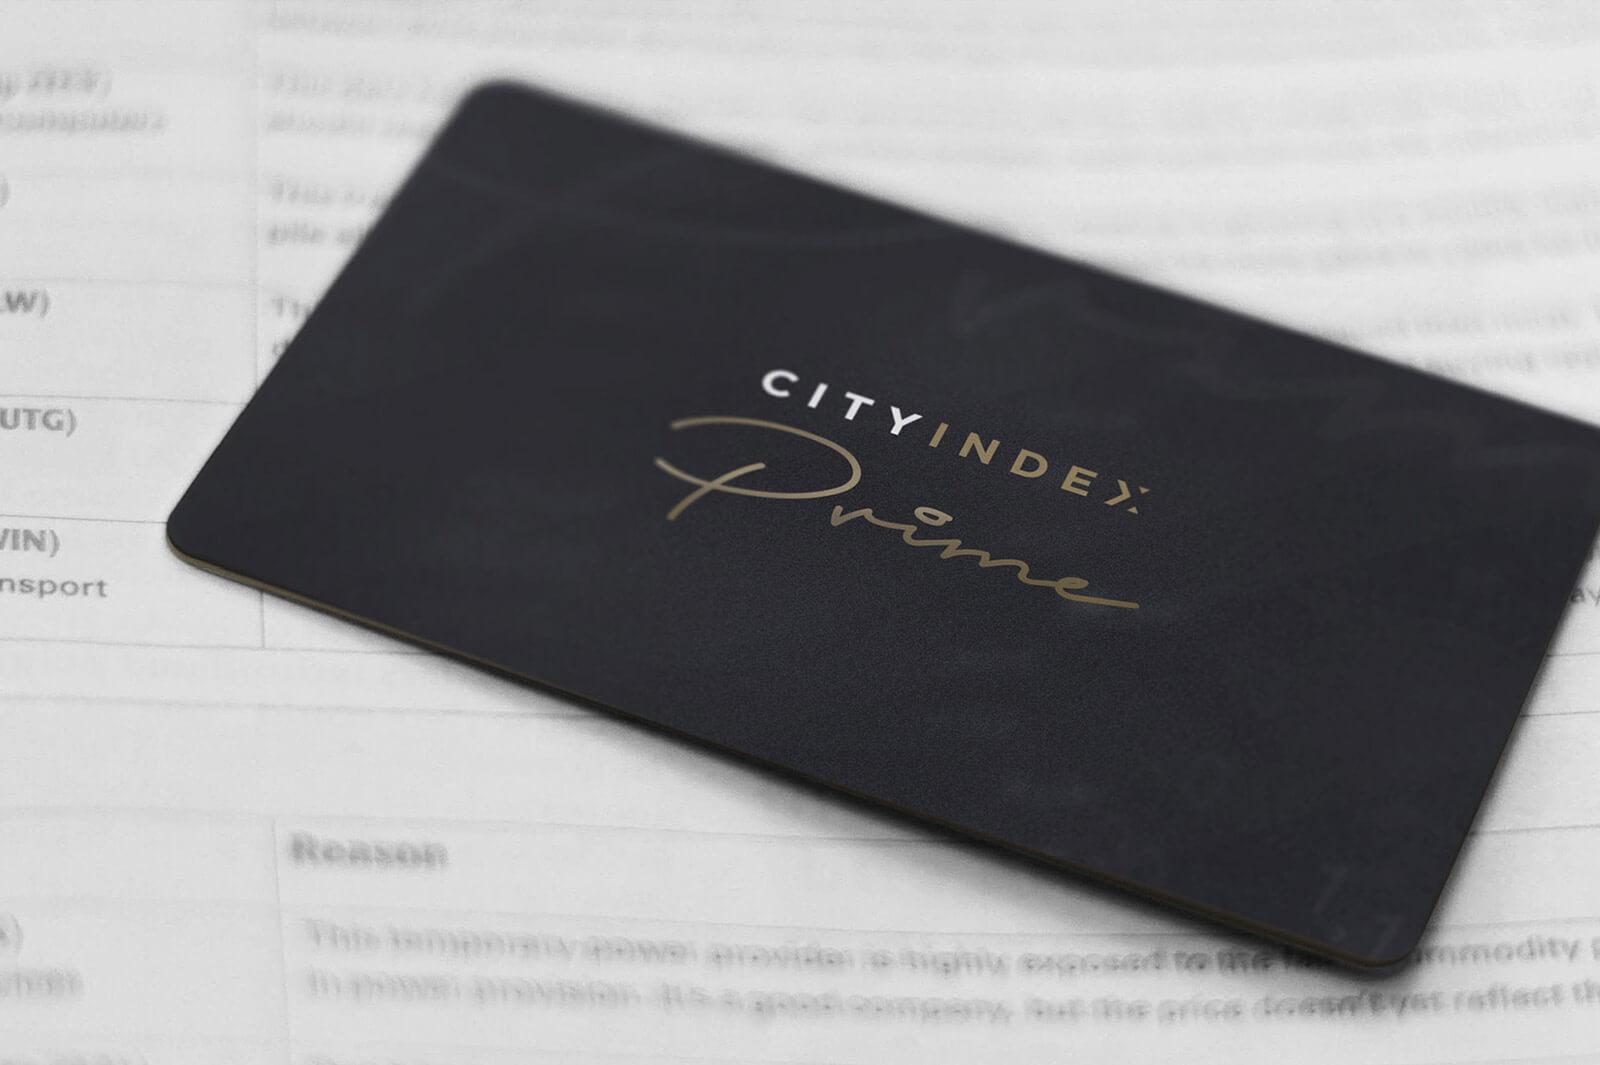 CityIndex_Prime_1